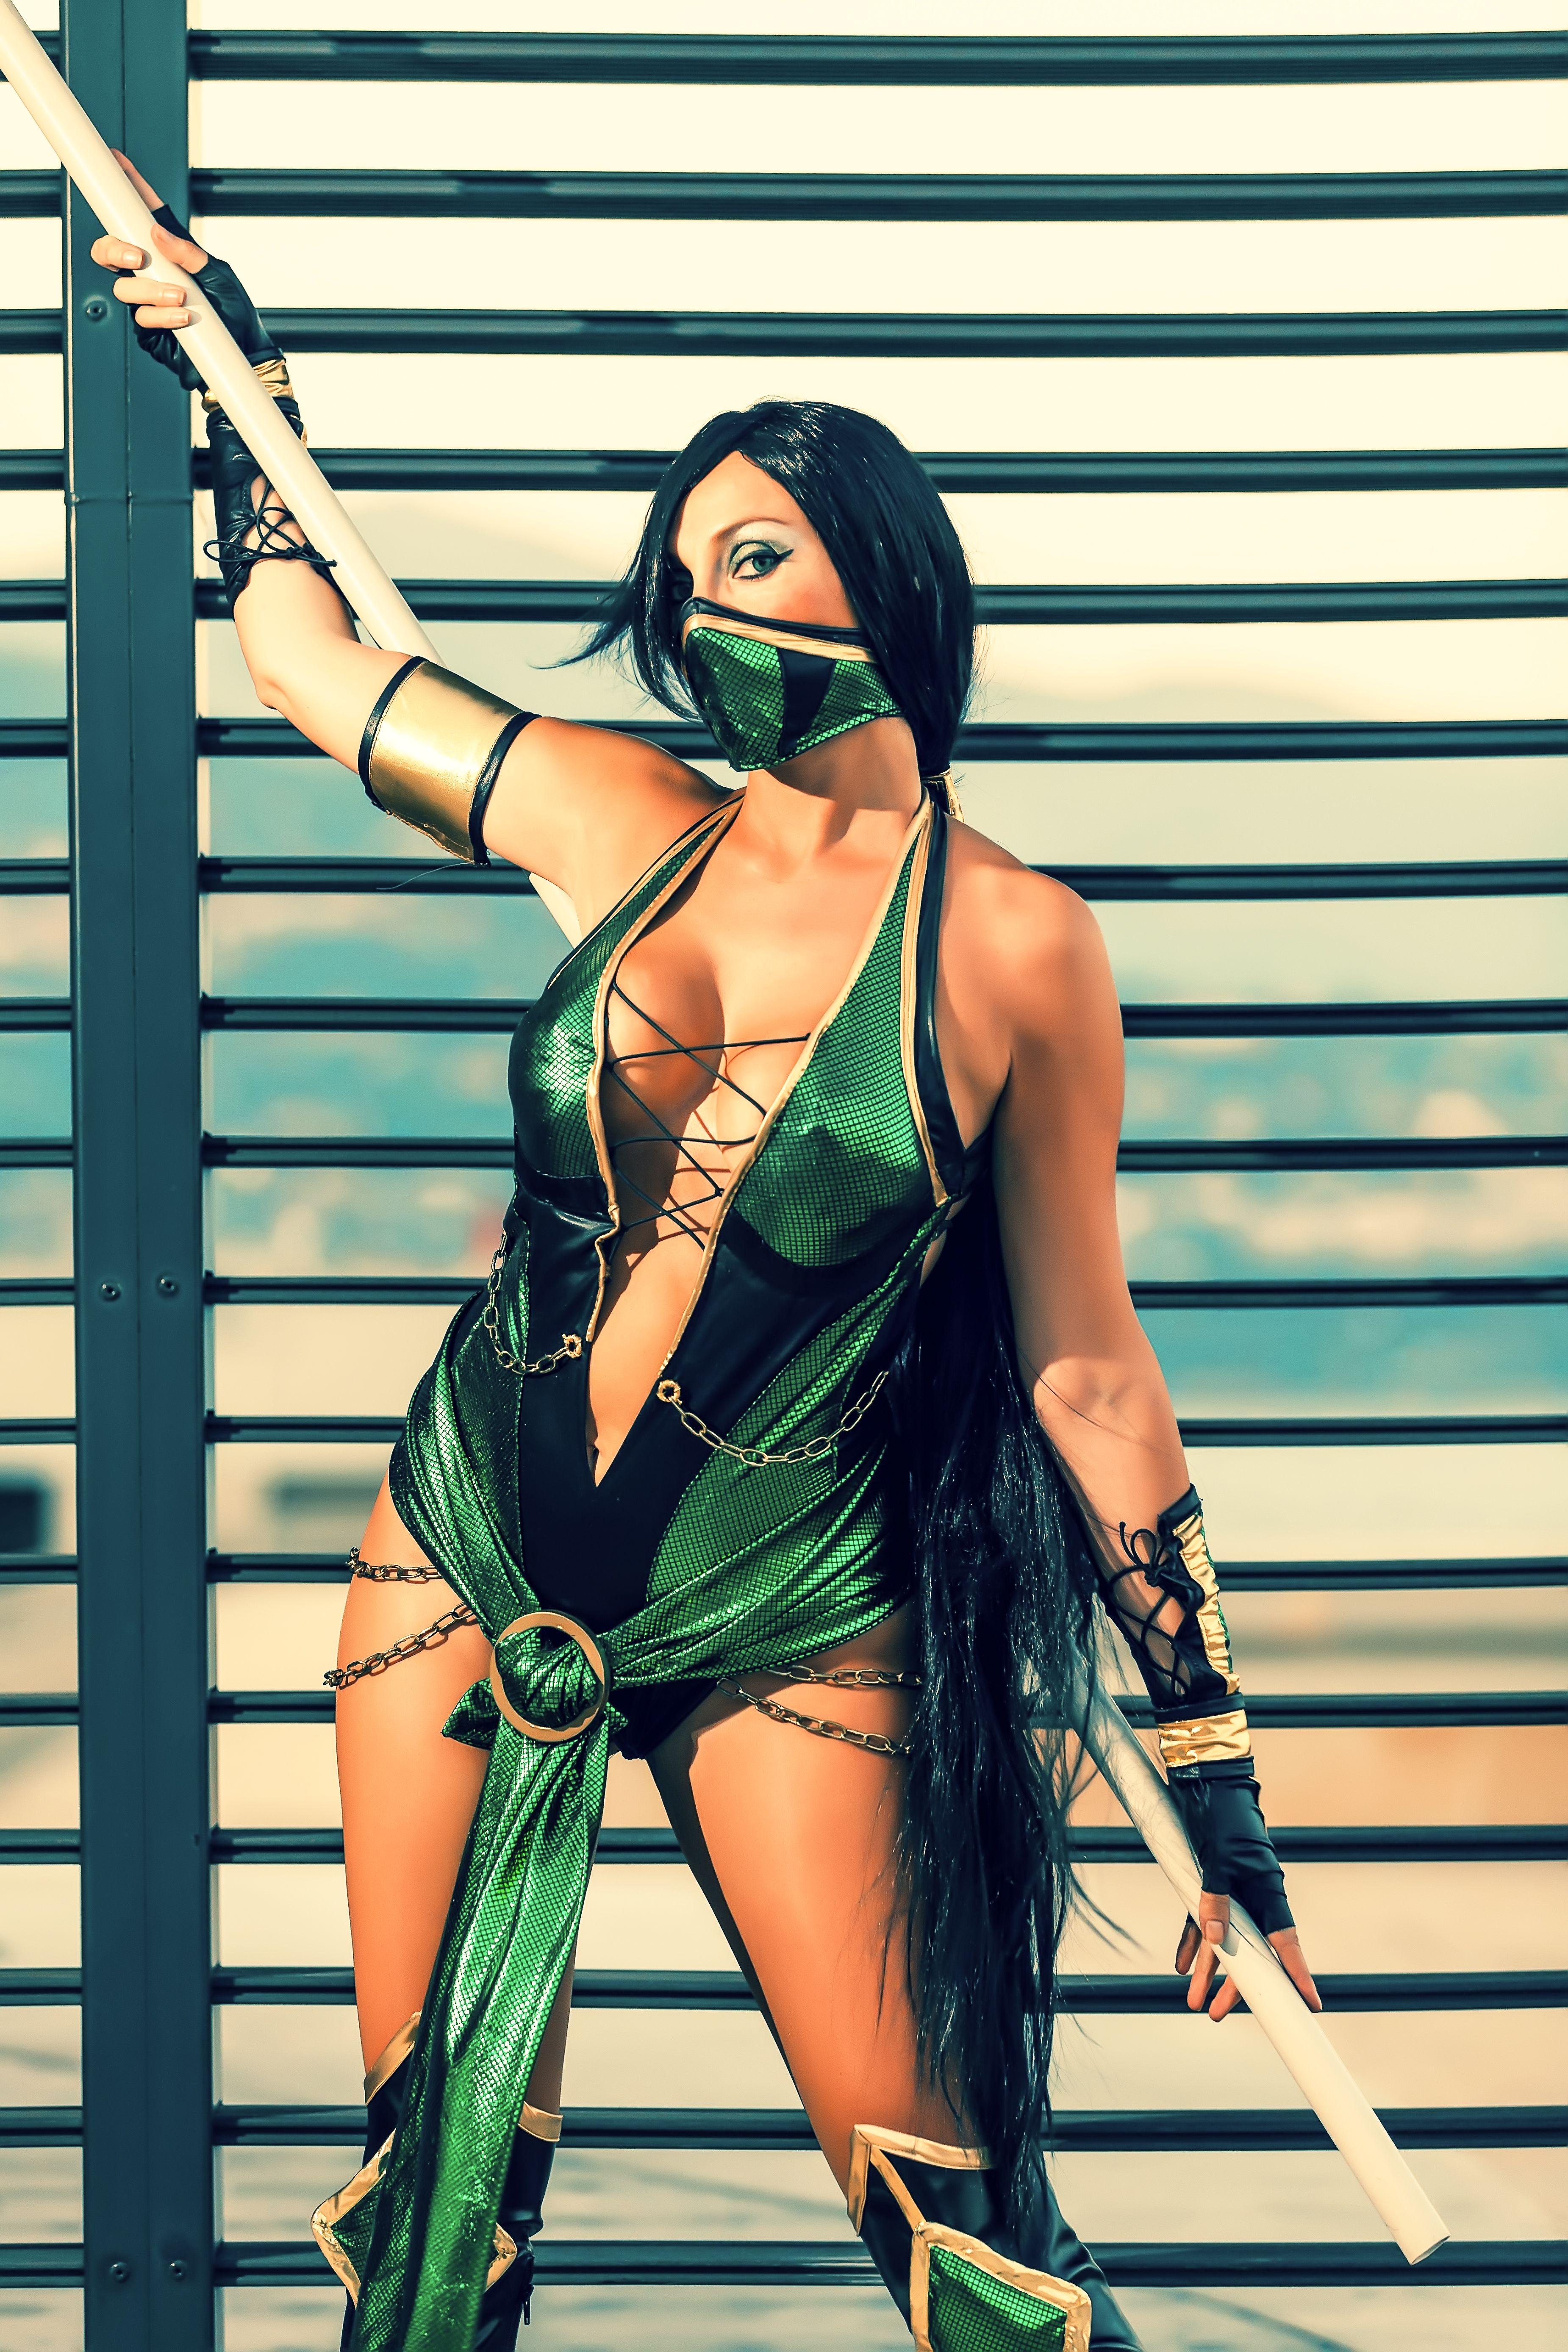 21 Cosplay Models Who Totally Nailed Jade From Mortal